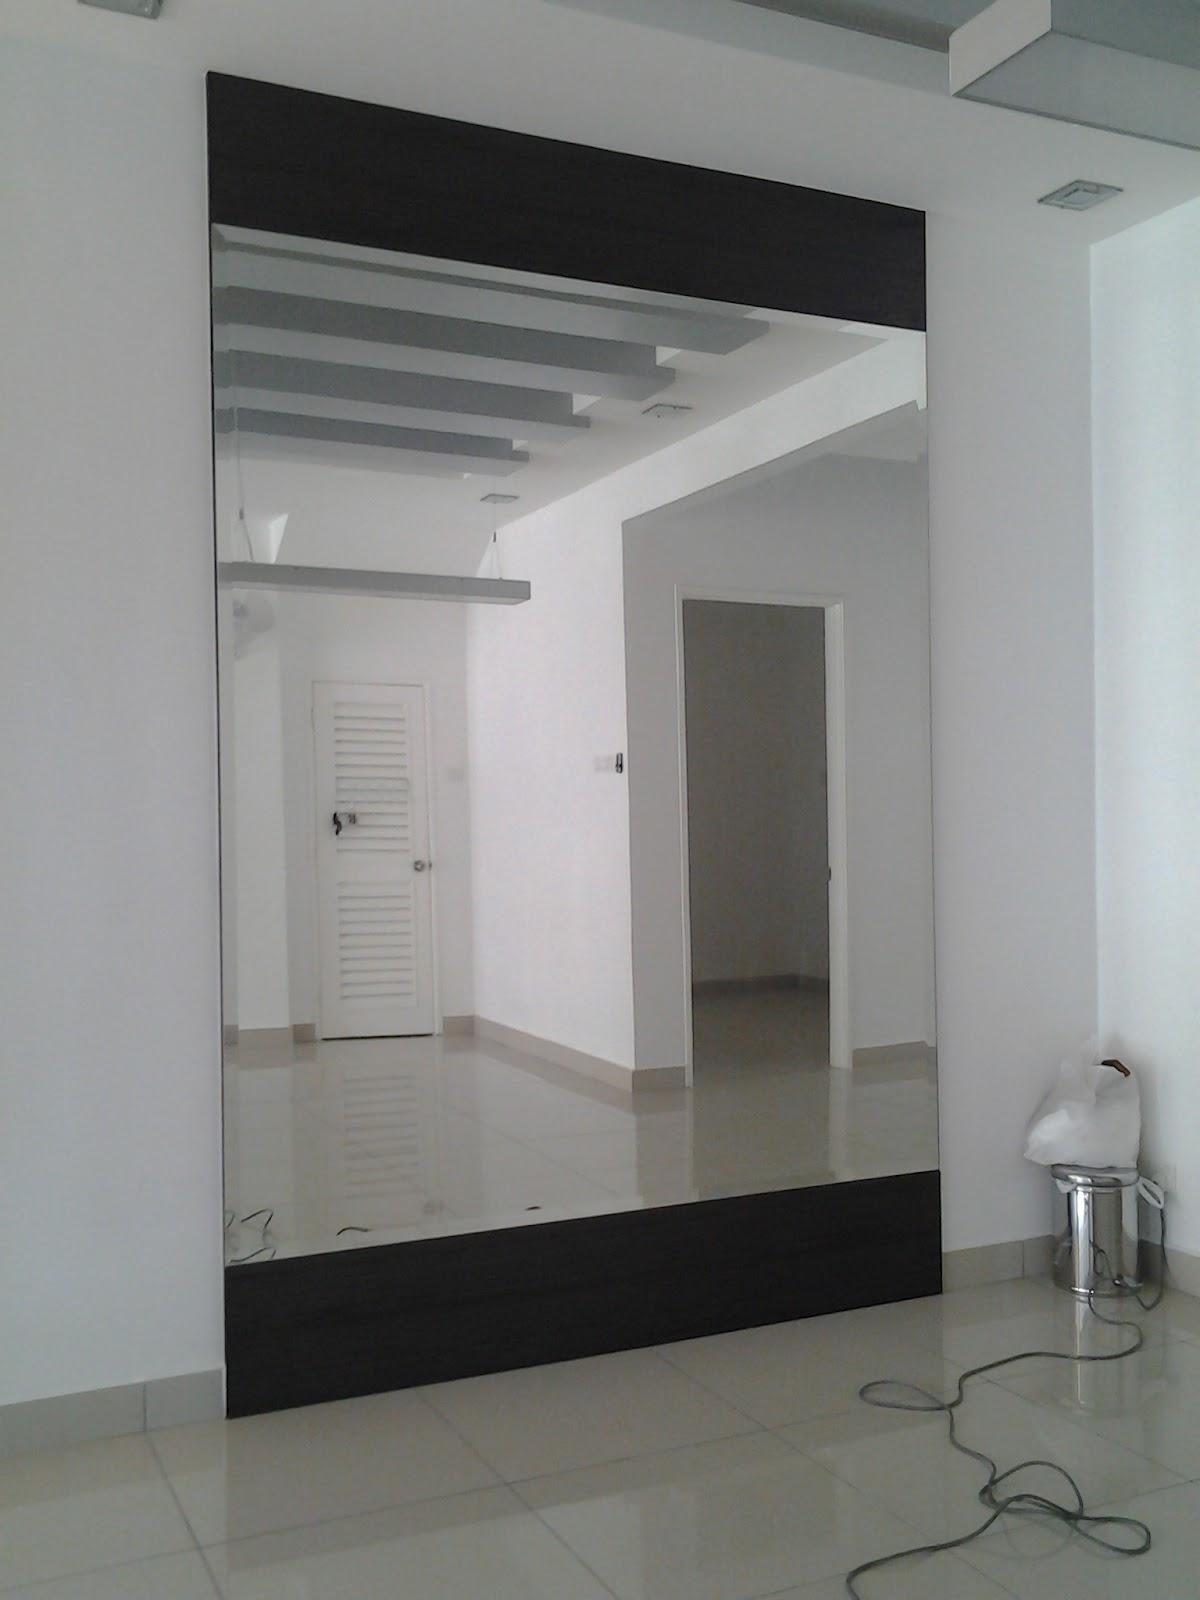 http://4.bp.blogspot.com/-8r2sqnaE3z4/T7yNNd_uPfI/AAAAAAAABMs/BBhLDXASyvA/s1600/hisham.wall.jpg